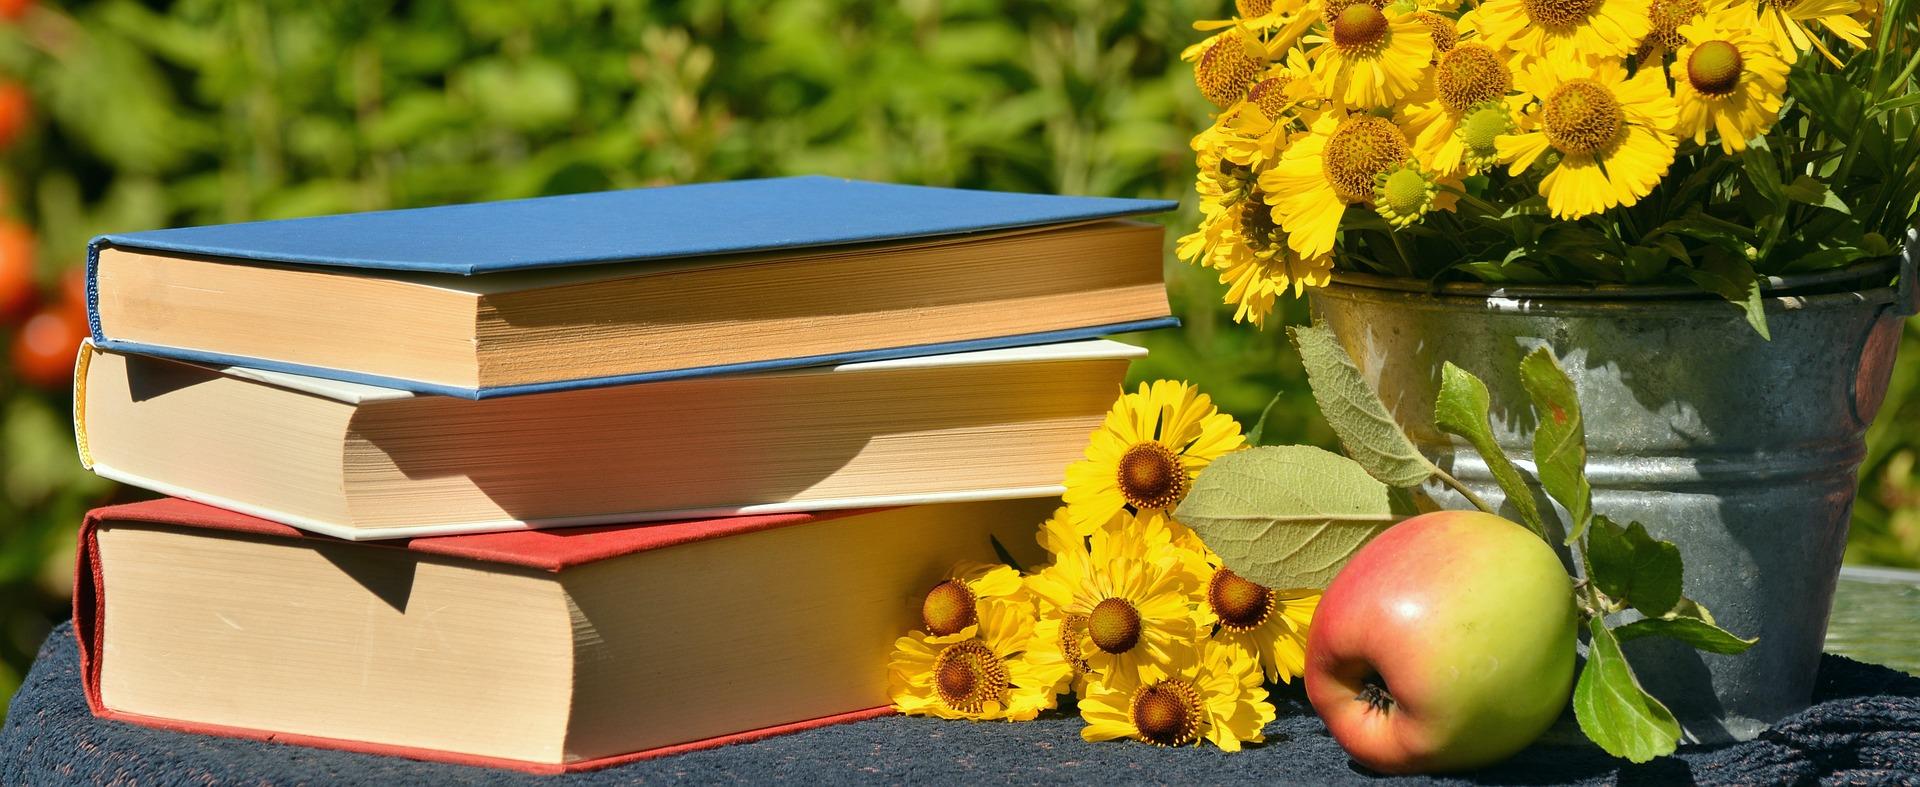 books flowers apple livres fleurs pomme